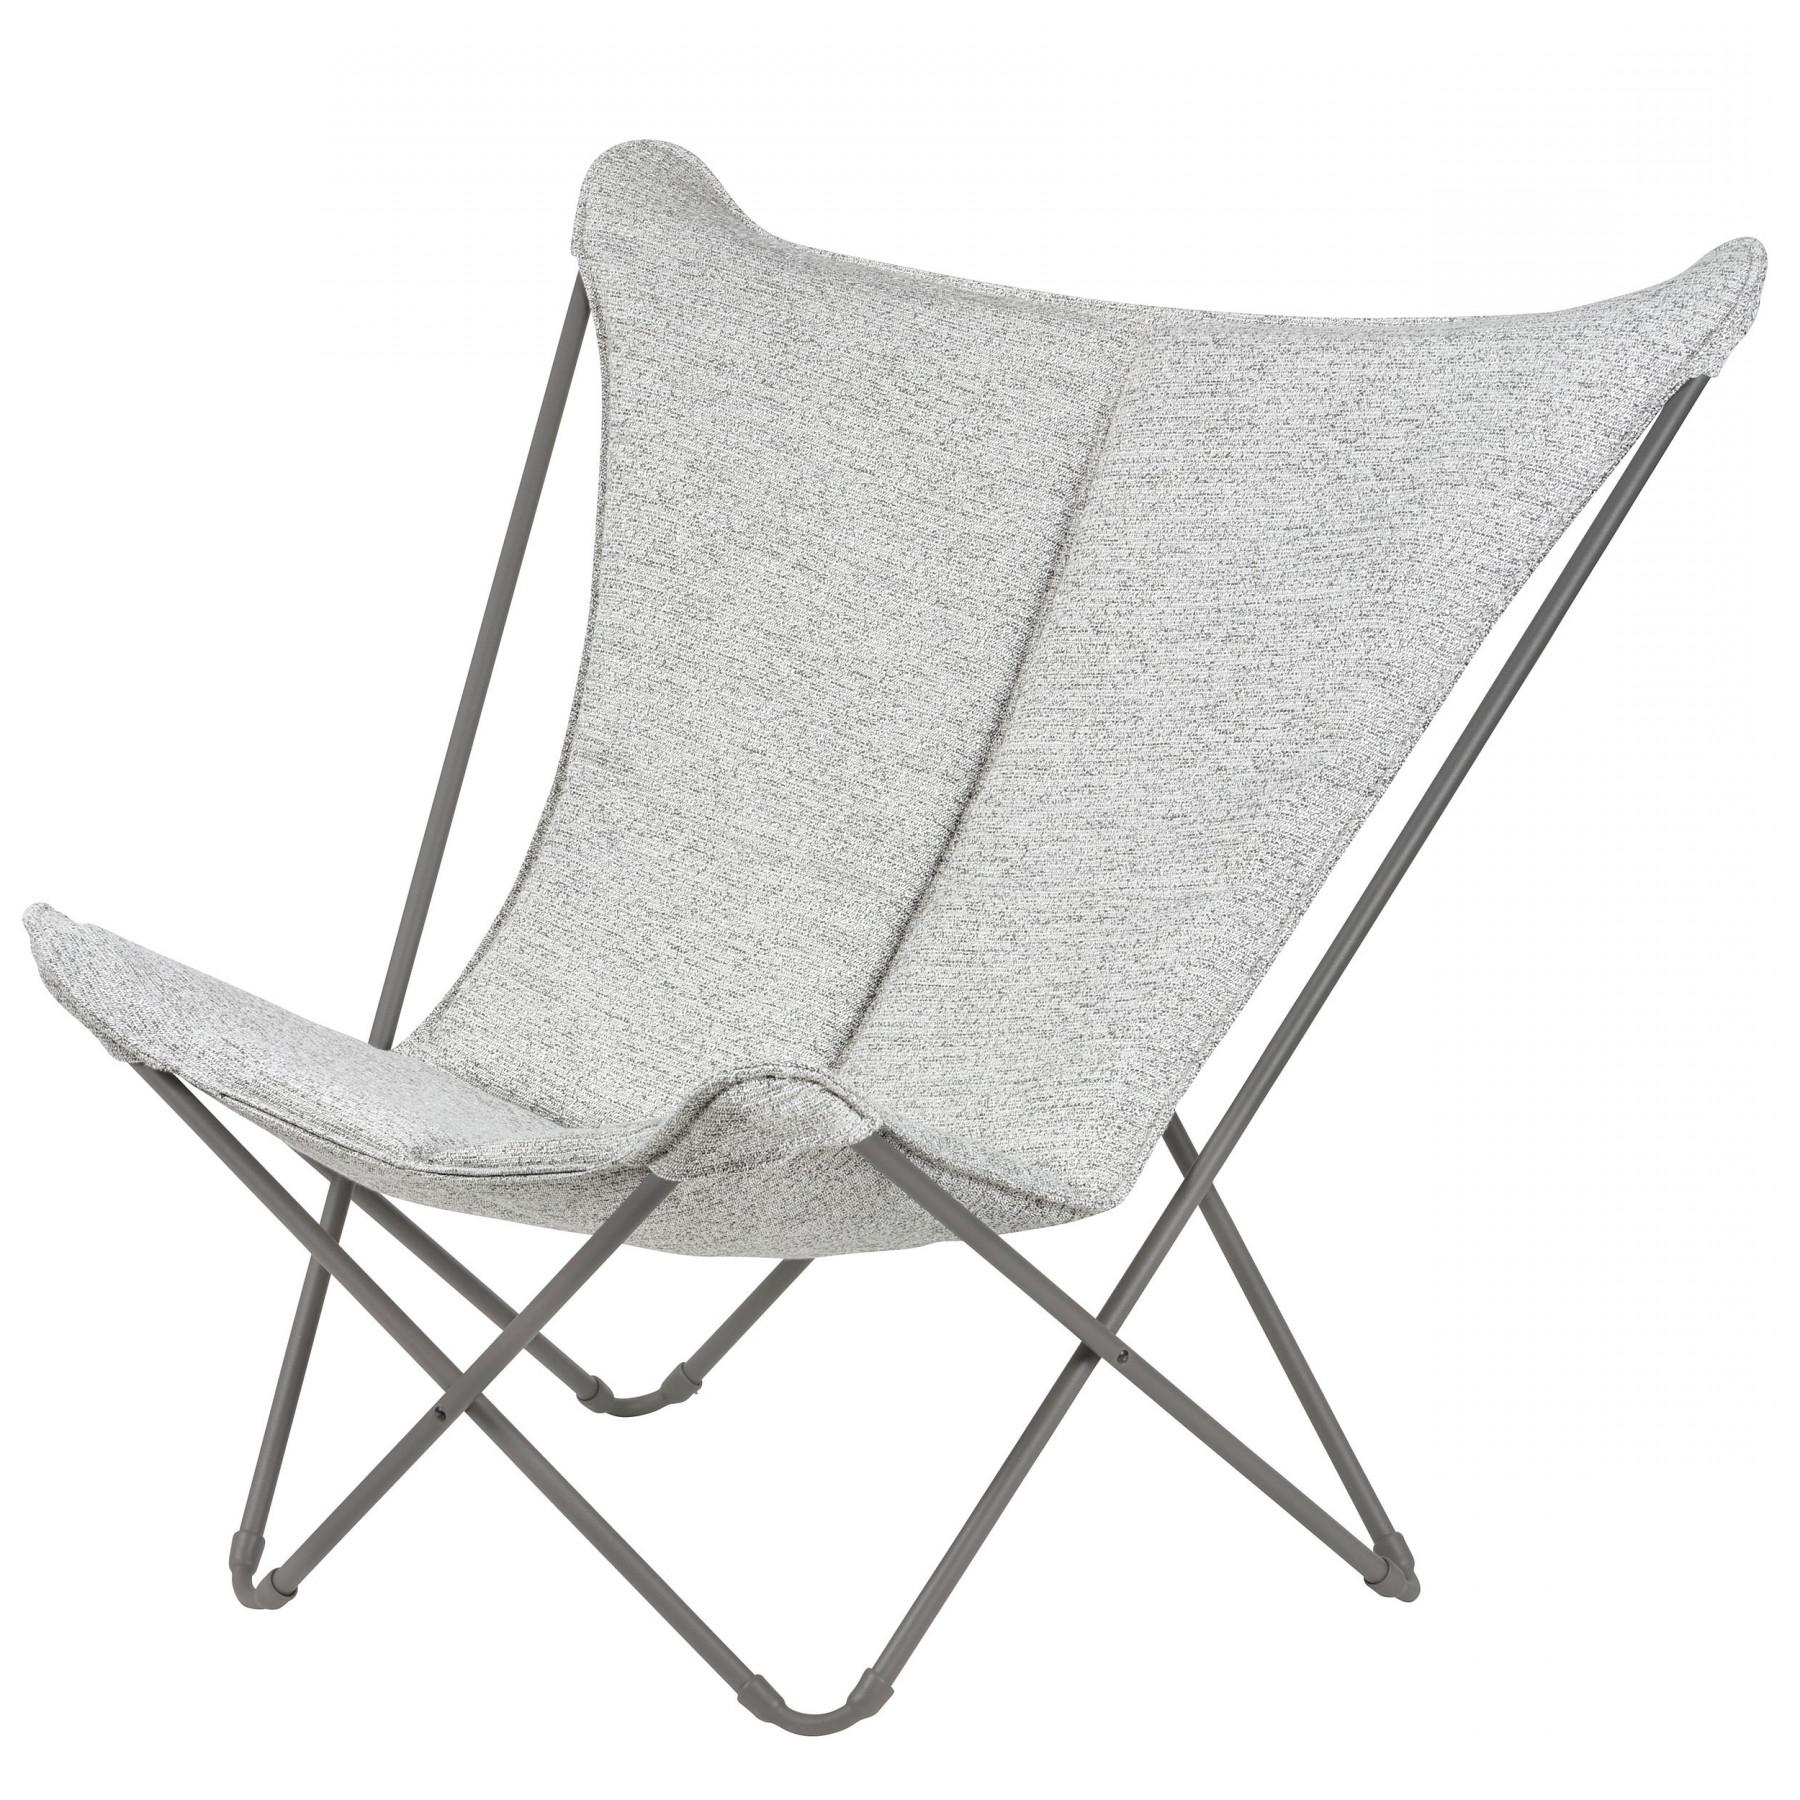 Folding Lounge Chair Sphinx Sunbrella Tundra (View 11 of 25)